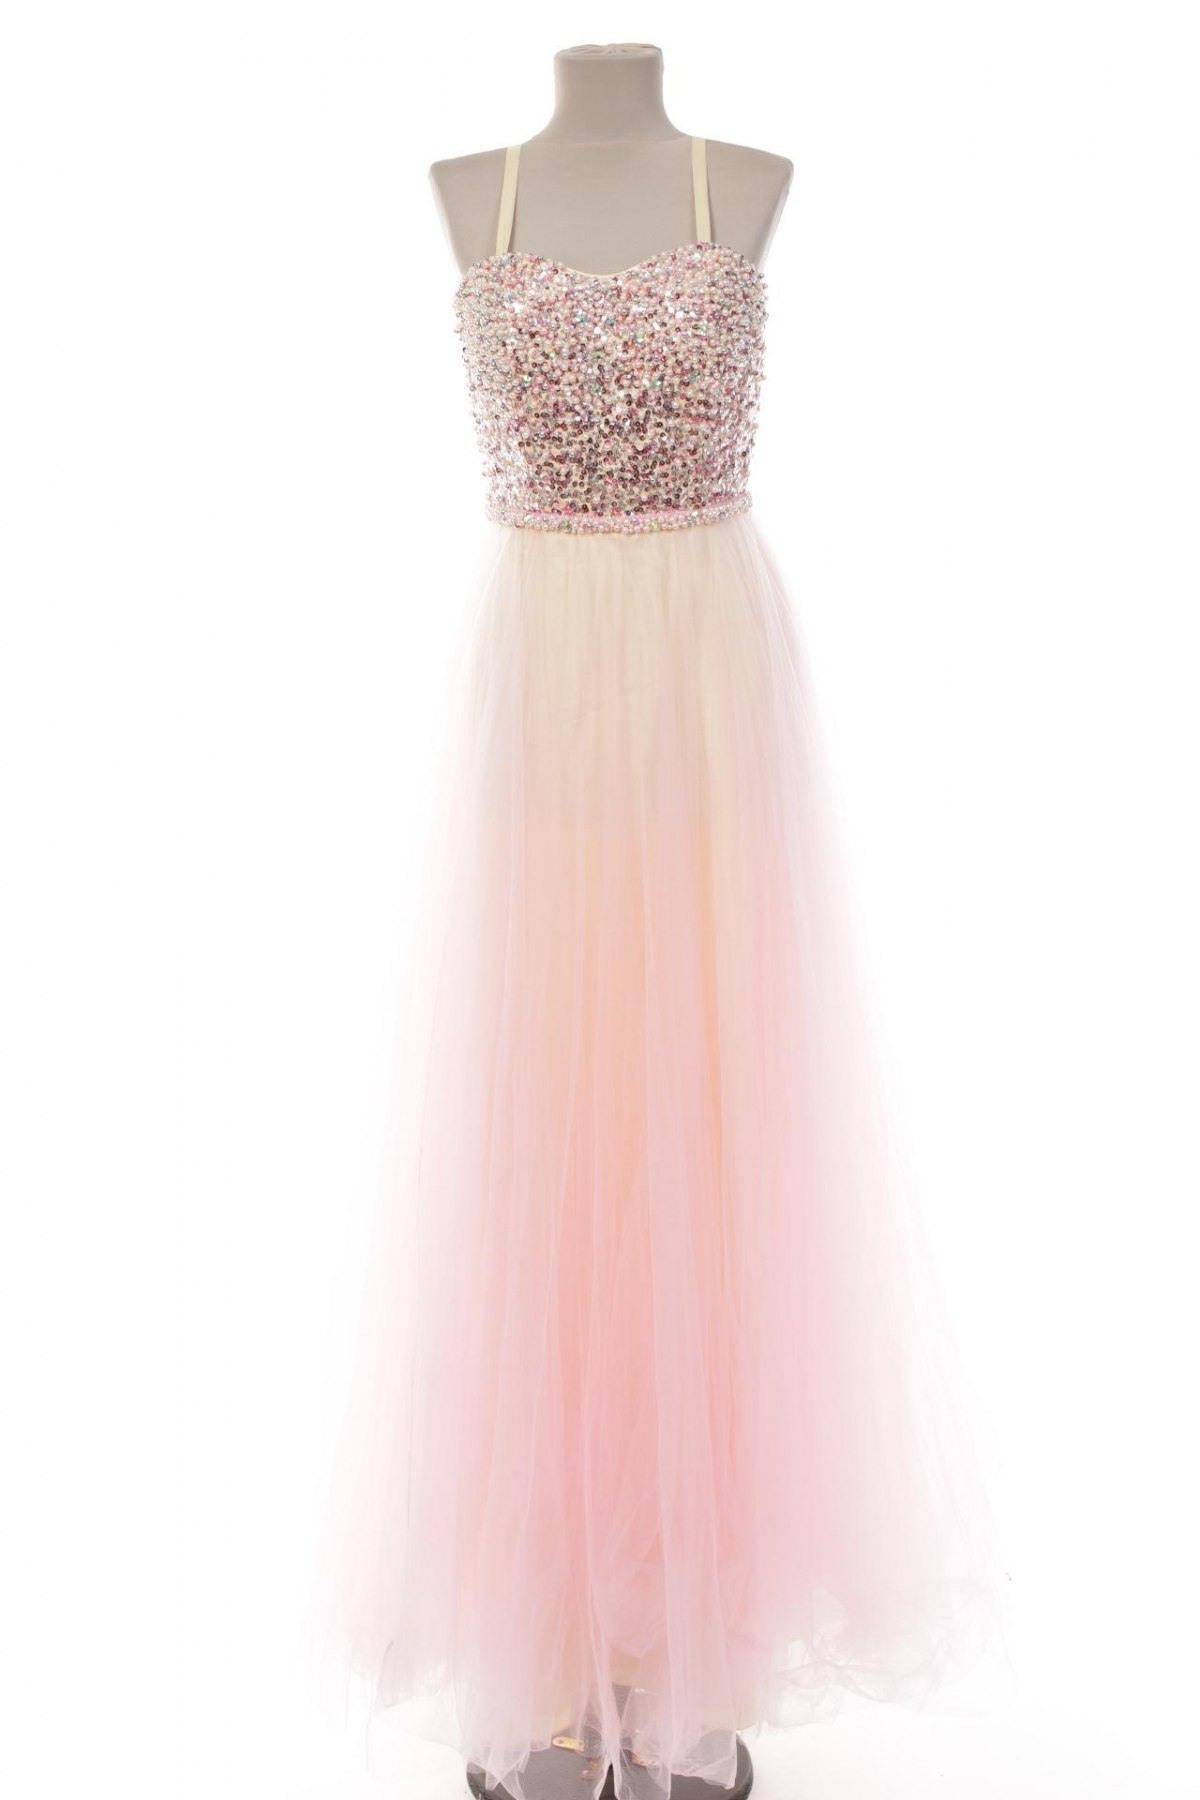 13 Wunderbar Luxuar Limited Abendkleid Spezialgebiet15 Kreativ Luxuar Limited Abendkleid Bester Preis